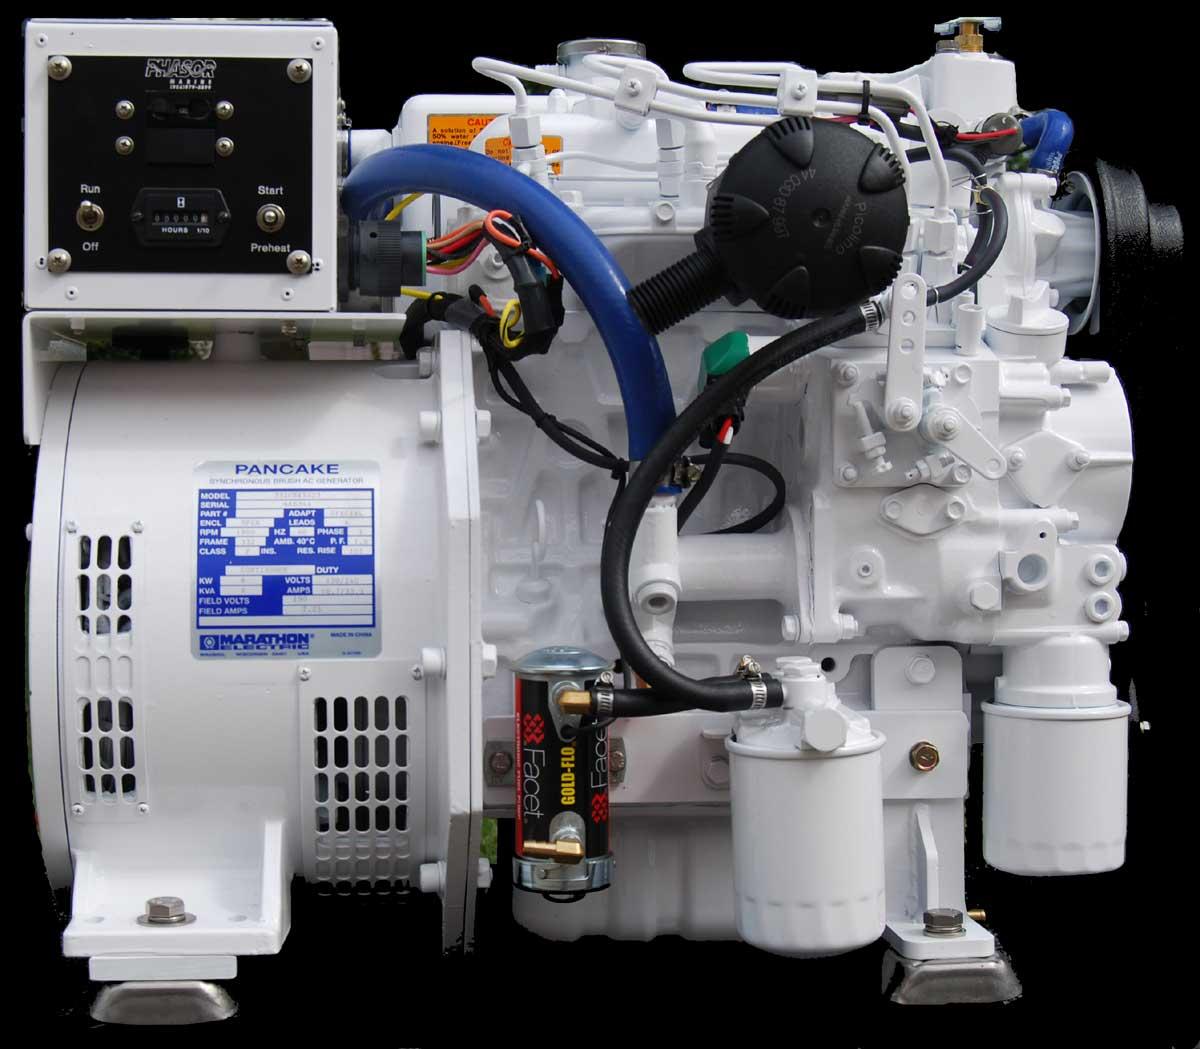 Phasor Marine Generators K3 6 5kw